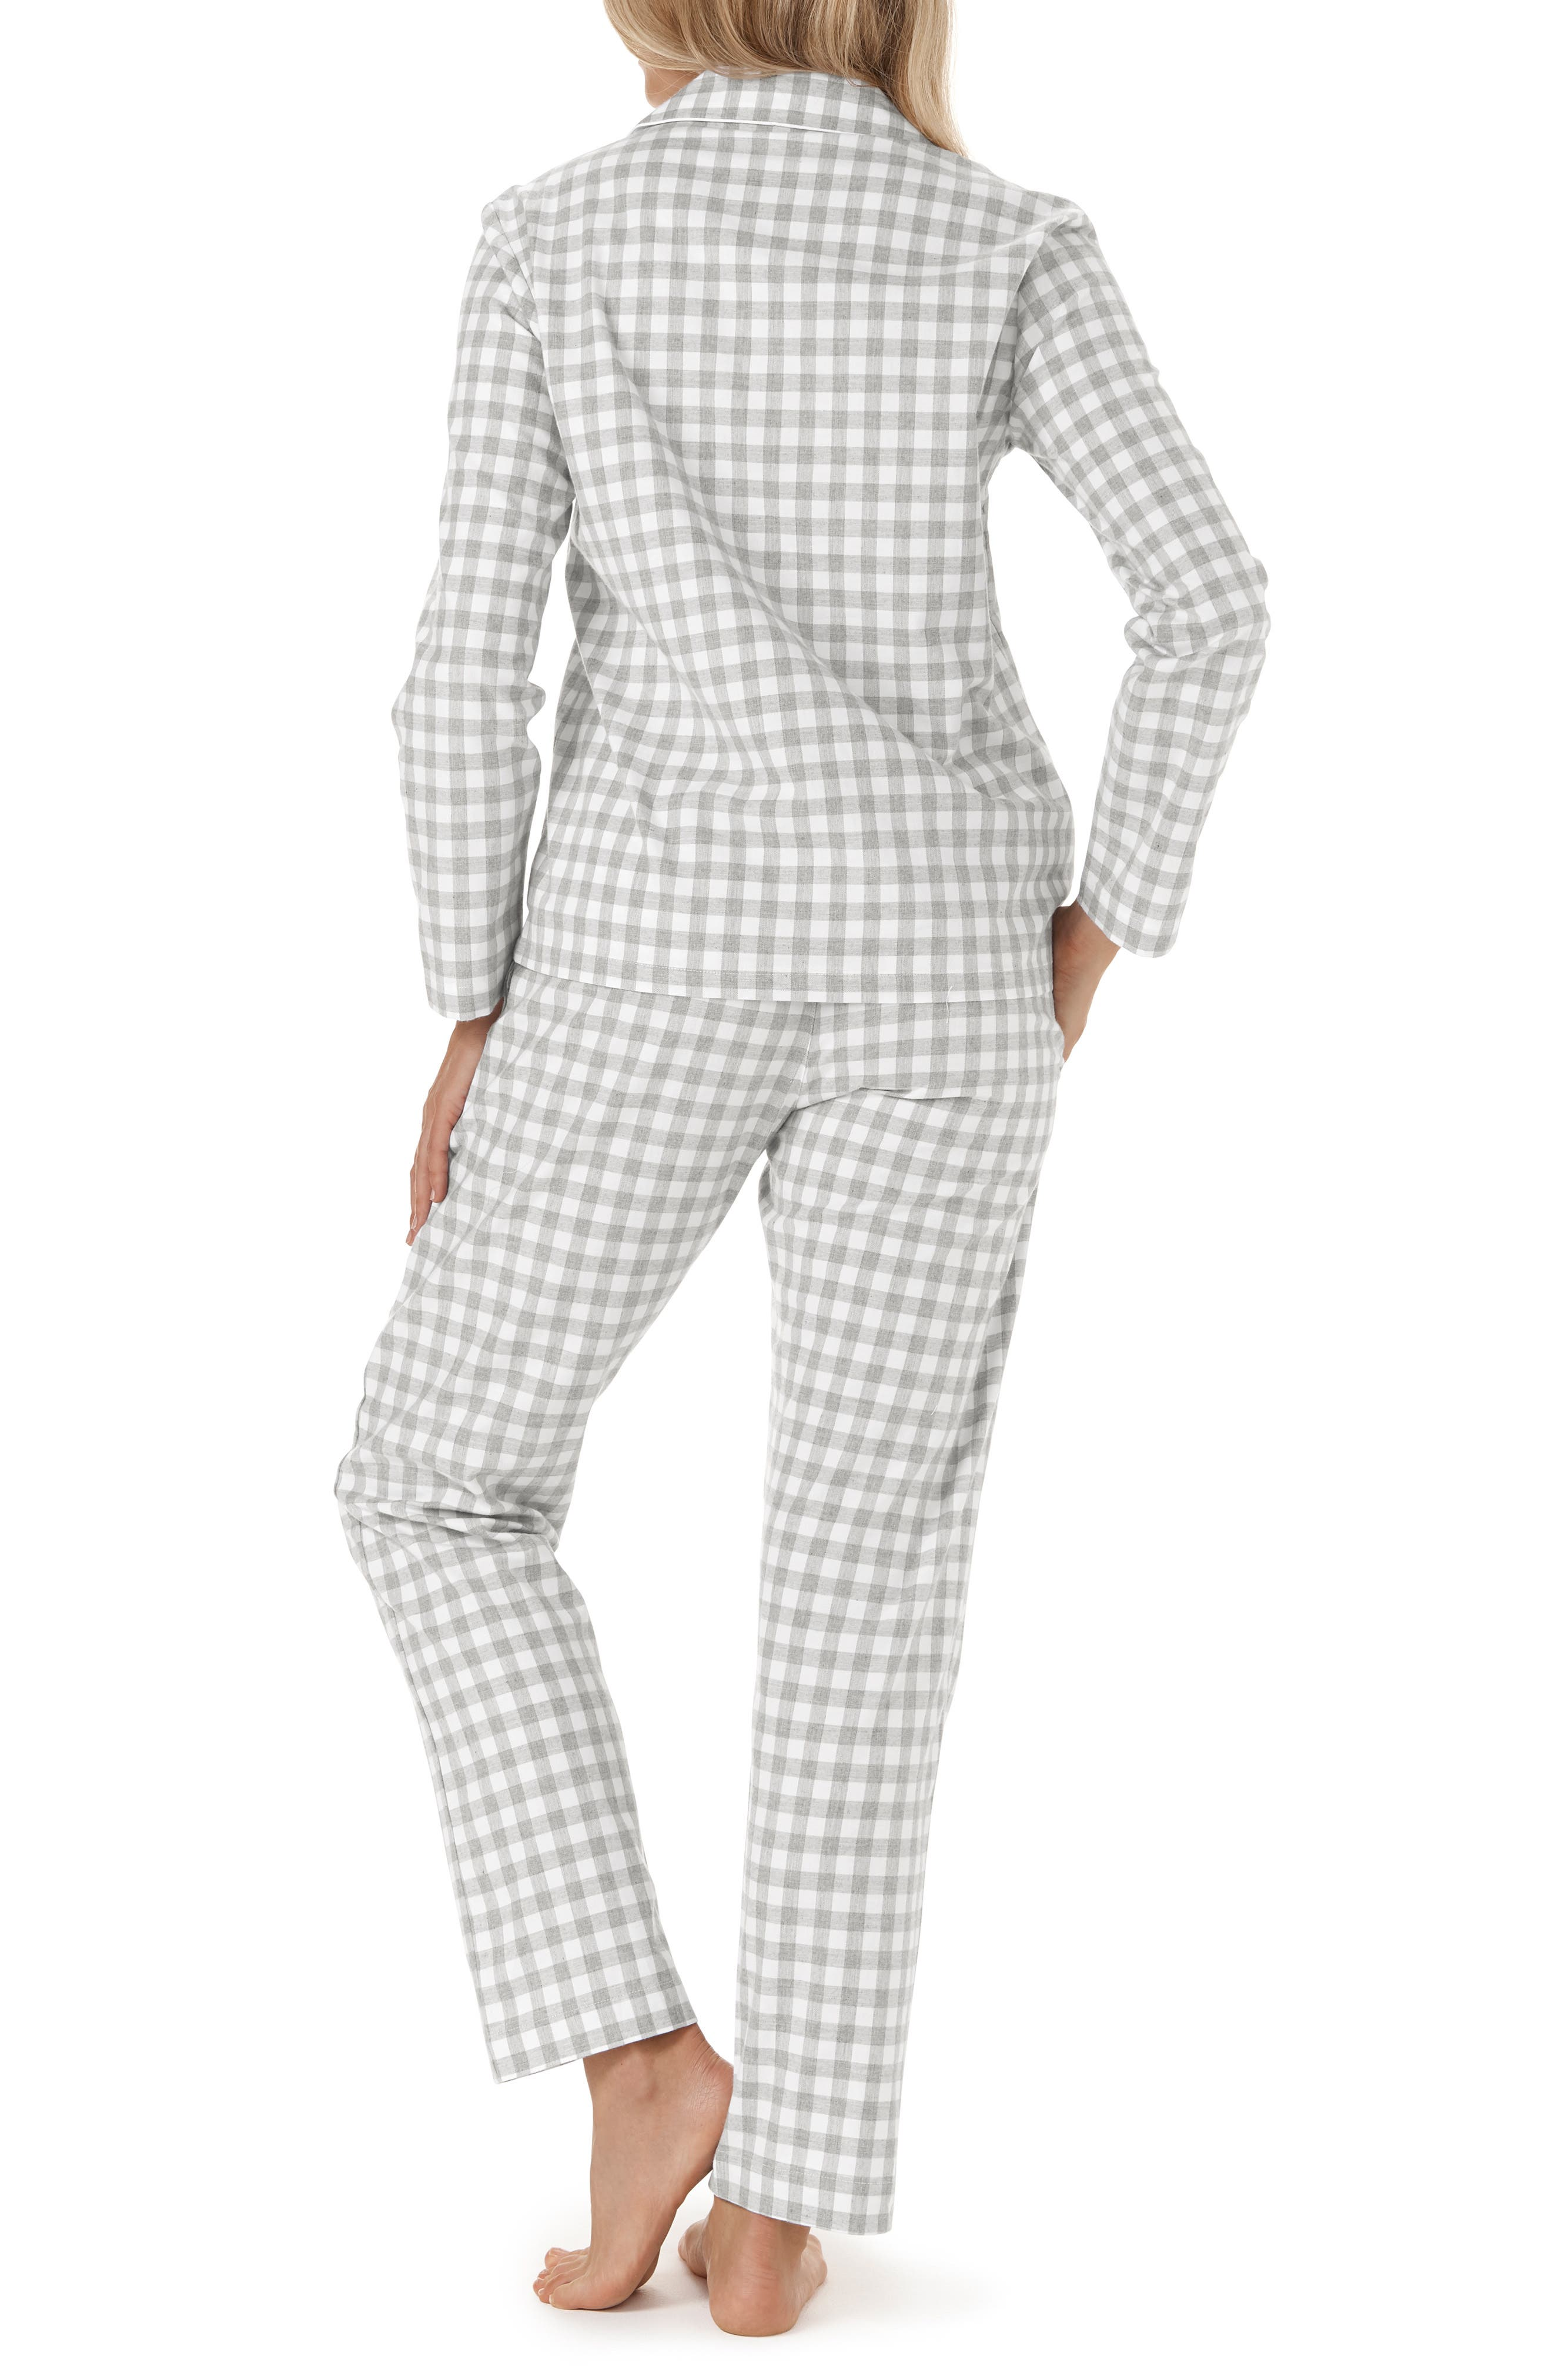 Gingham Check Pajamas,                             Alternate thumbnail 2, color,                             GREY/ WHITE GINGHAM